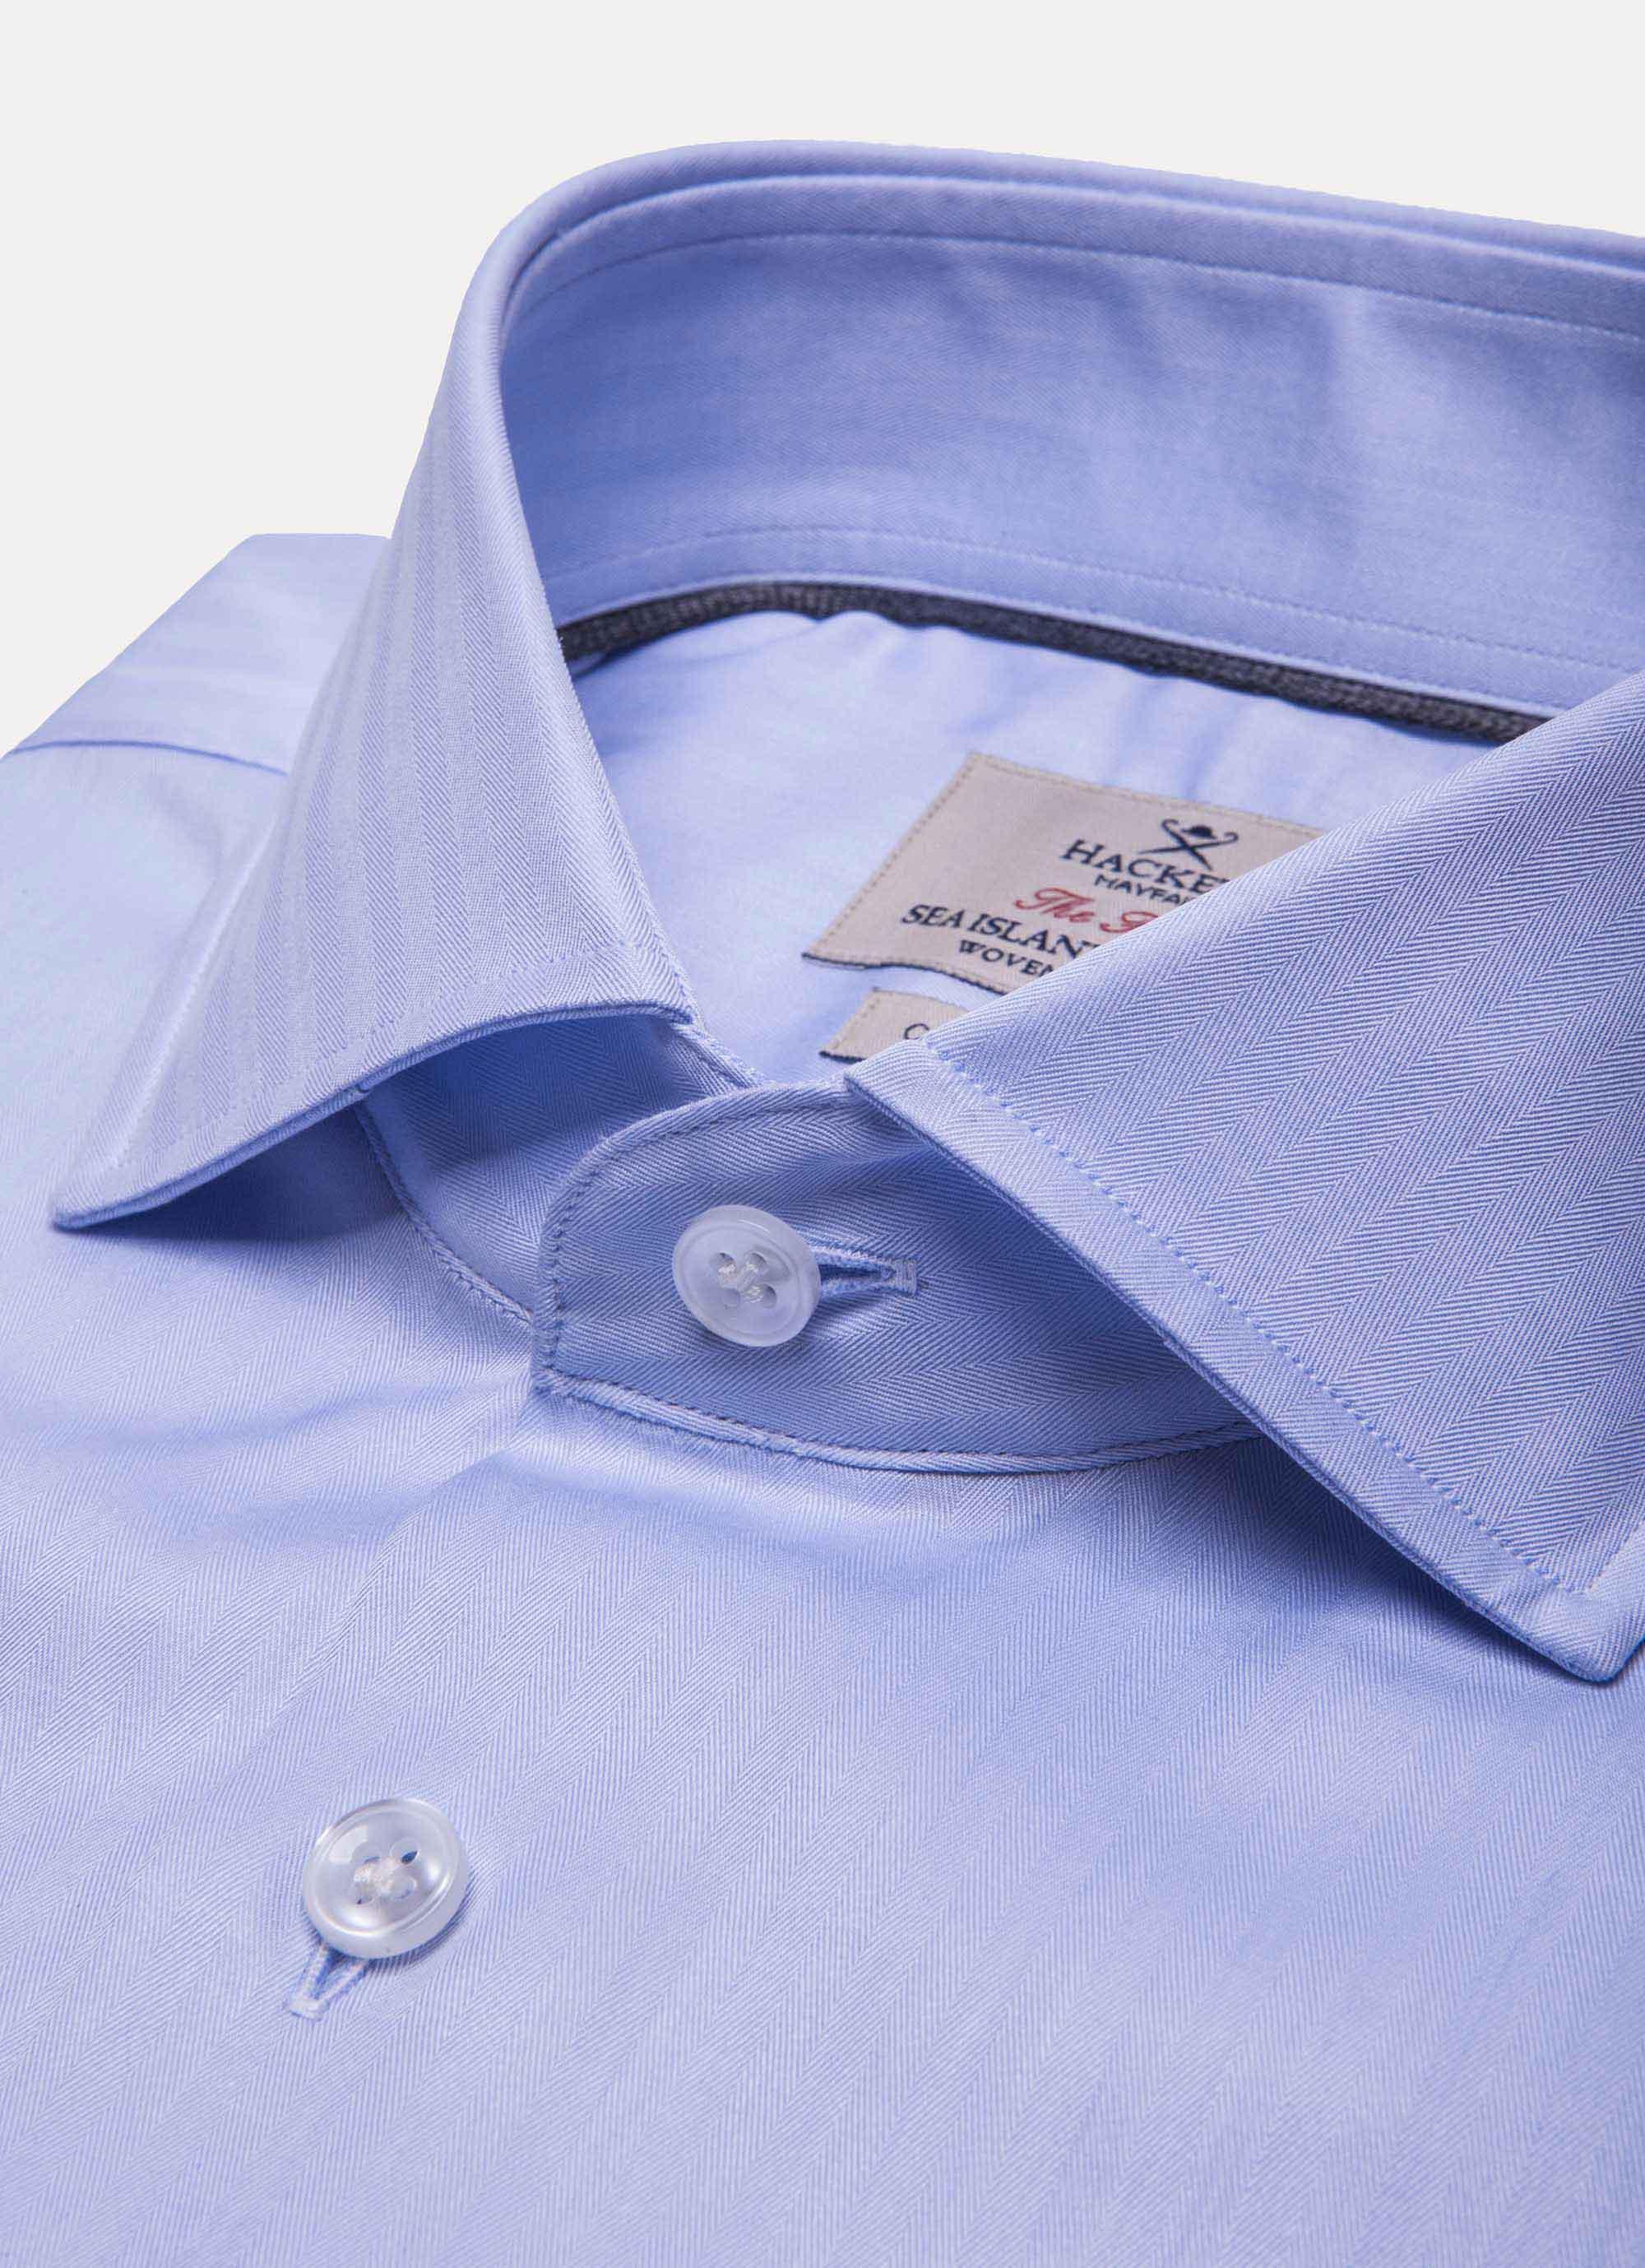 Hackett Luxurious Sea Island Cotton Shirt In Blue For Men Lyst